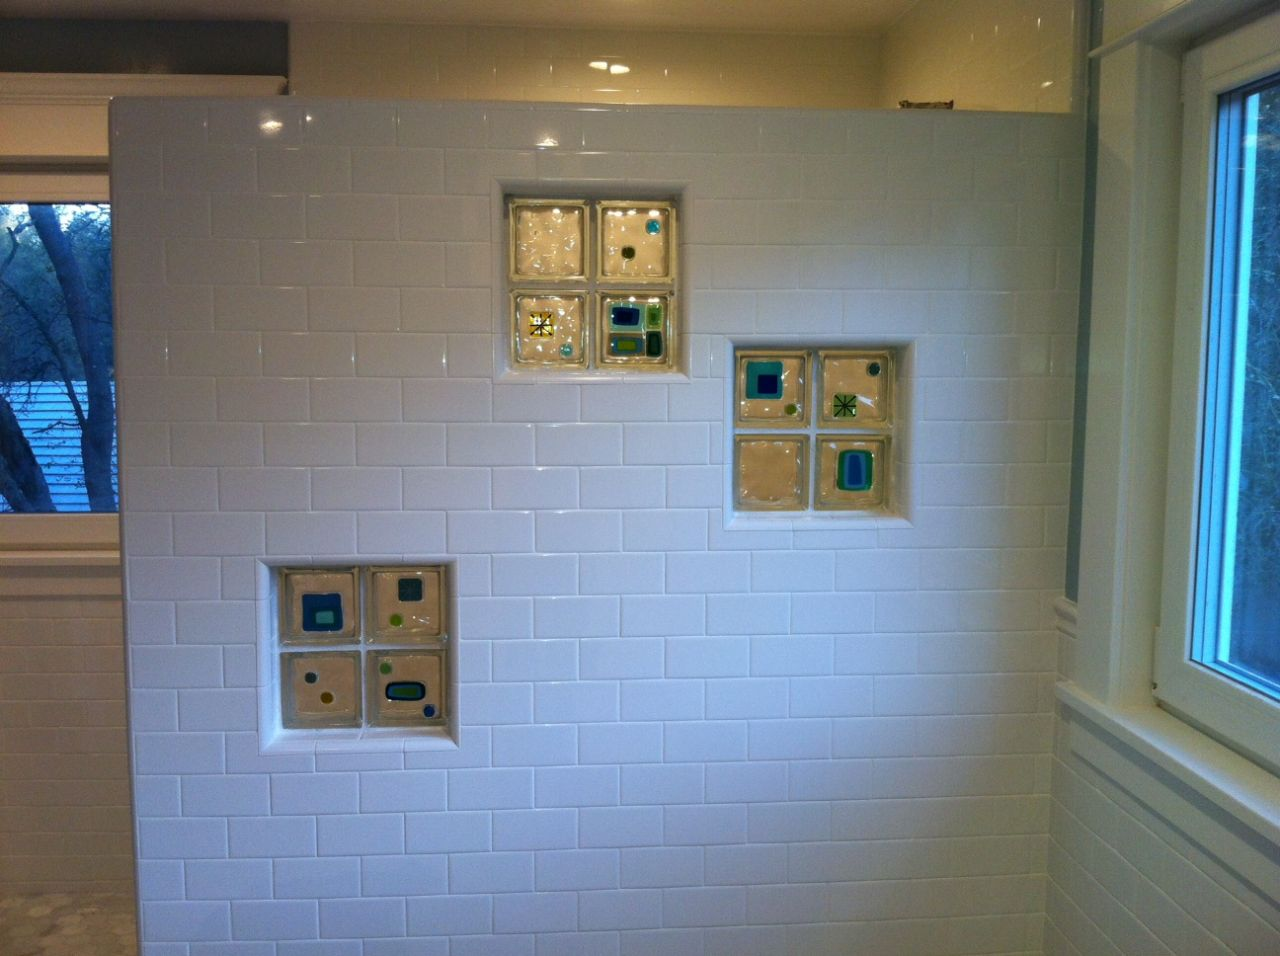 California bath remodel, pedestal tub, glass tile blocks, subway tile